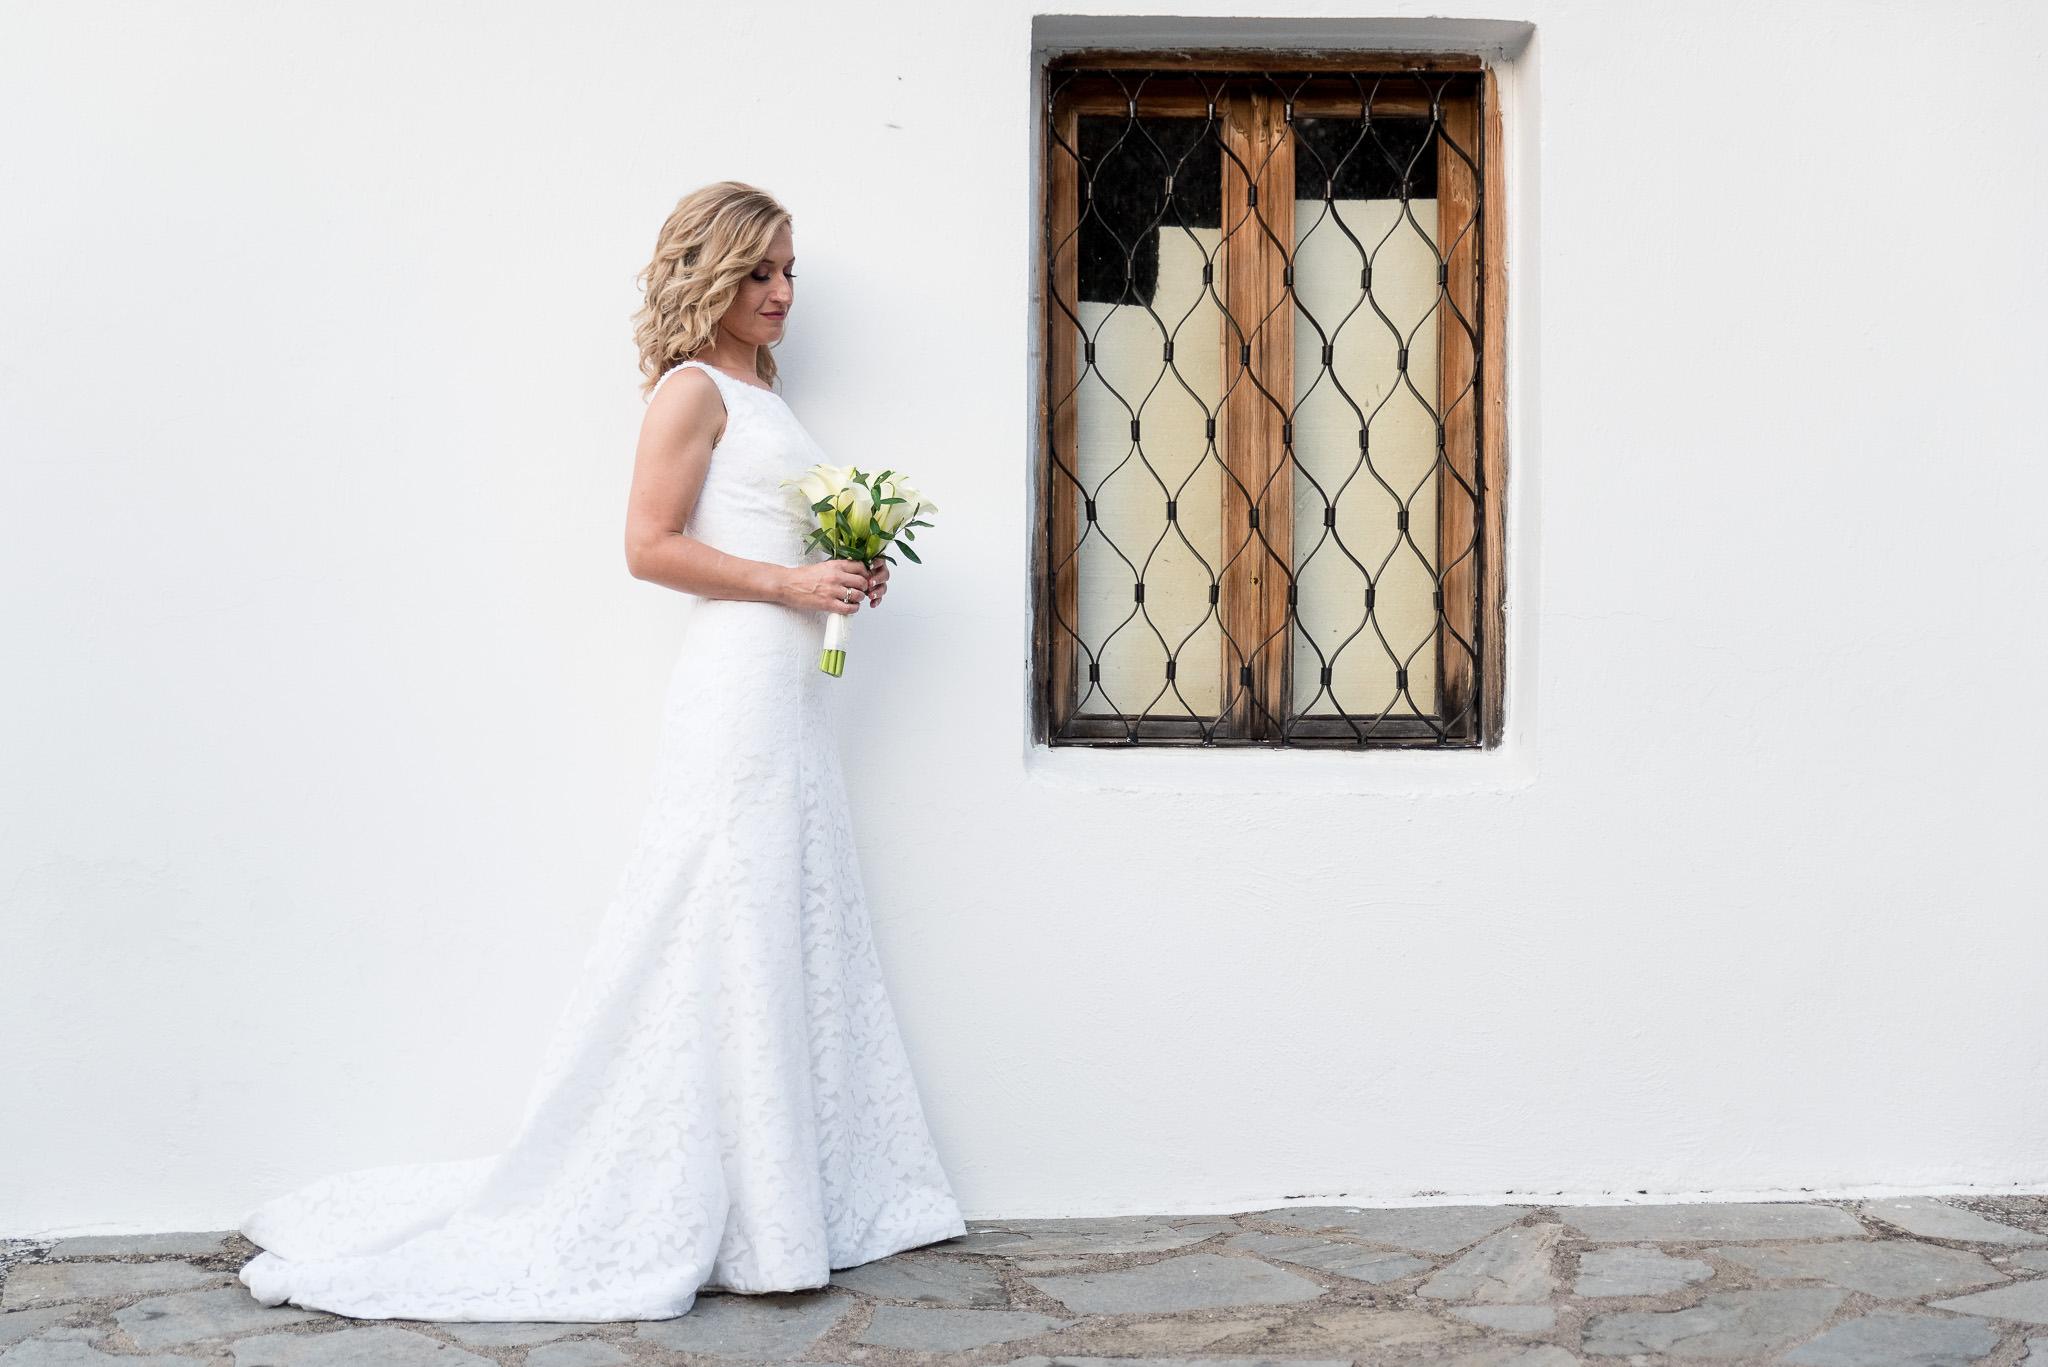 charis-avramidis-photography-wedding-gamos-vaptisi-photoshooting-christening-baptism-giannitsa-thessaloniki-weddingday-ellada-greece